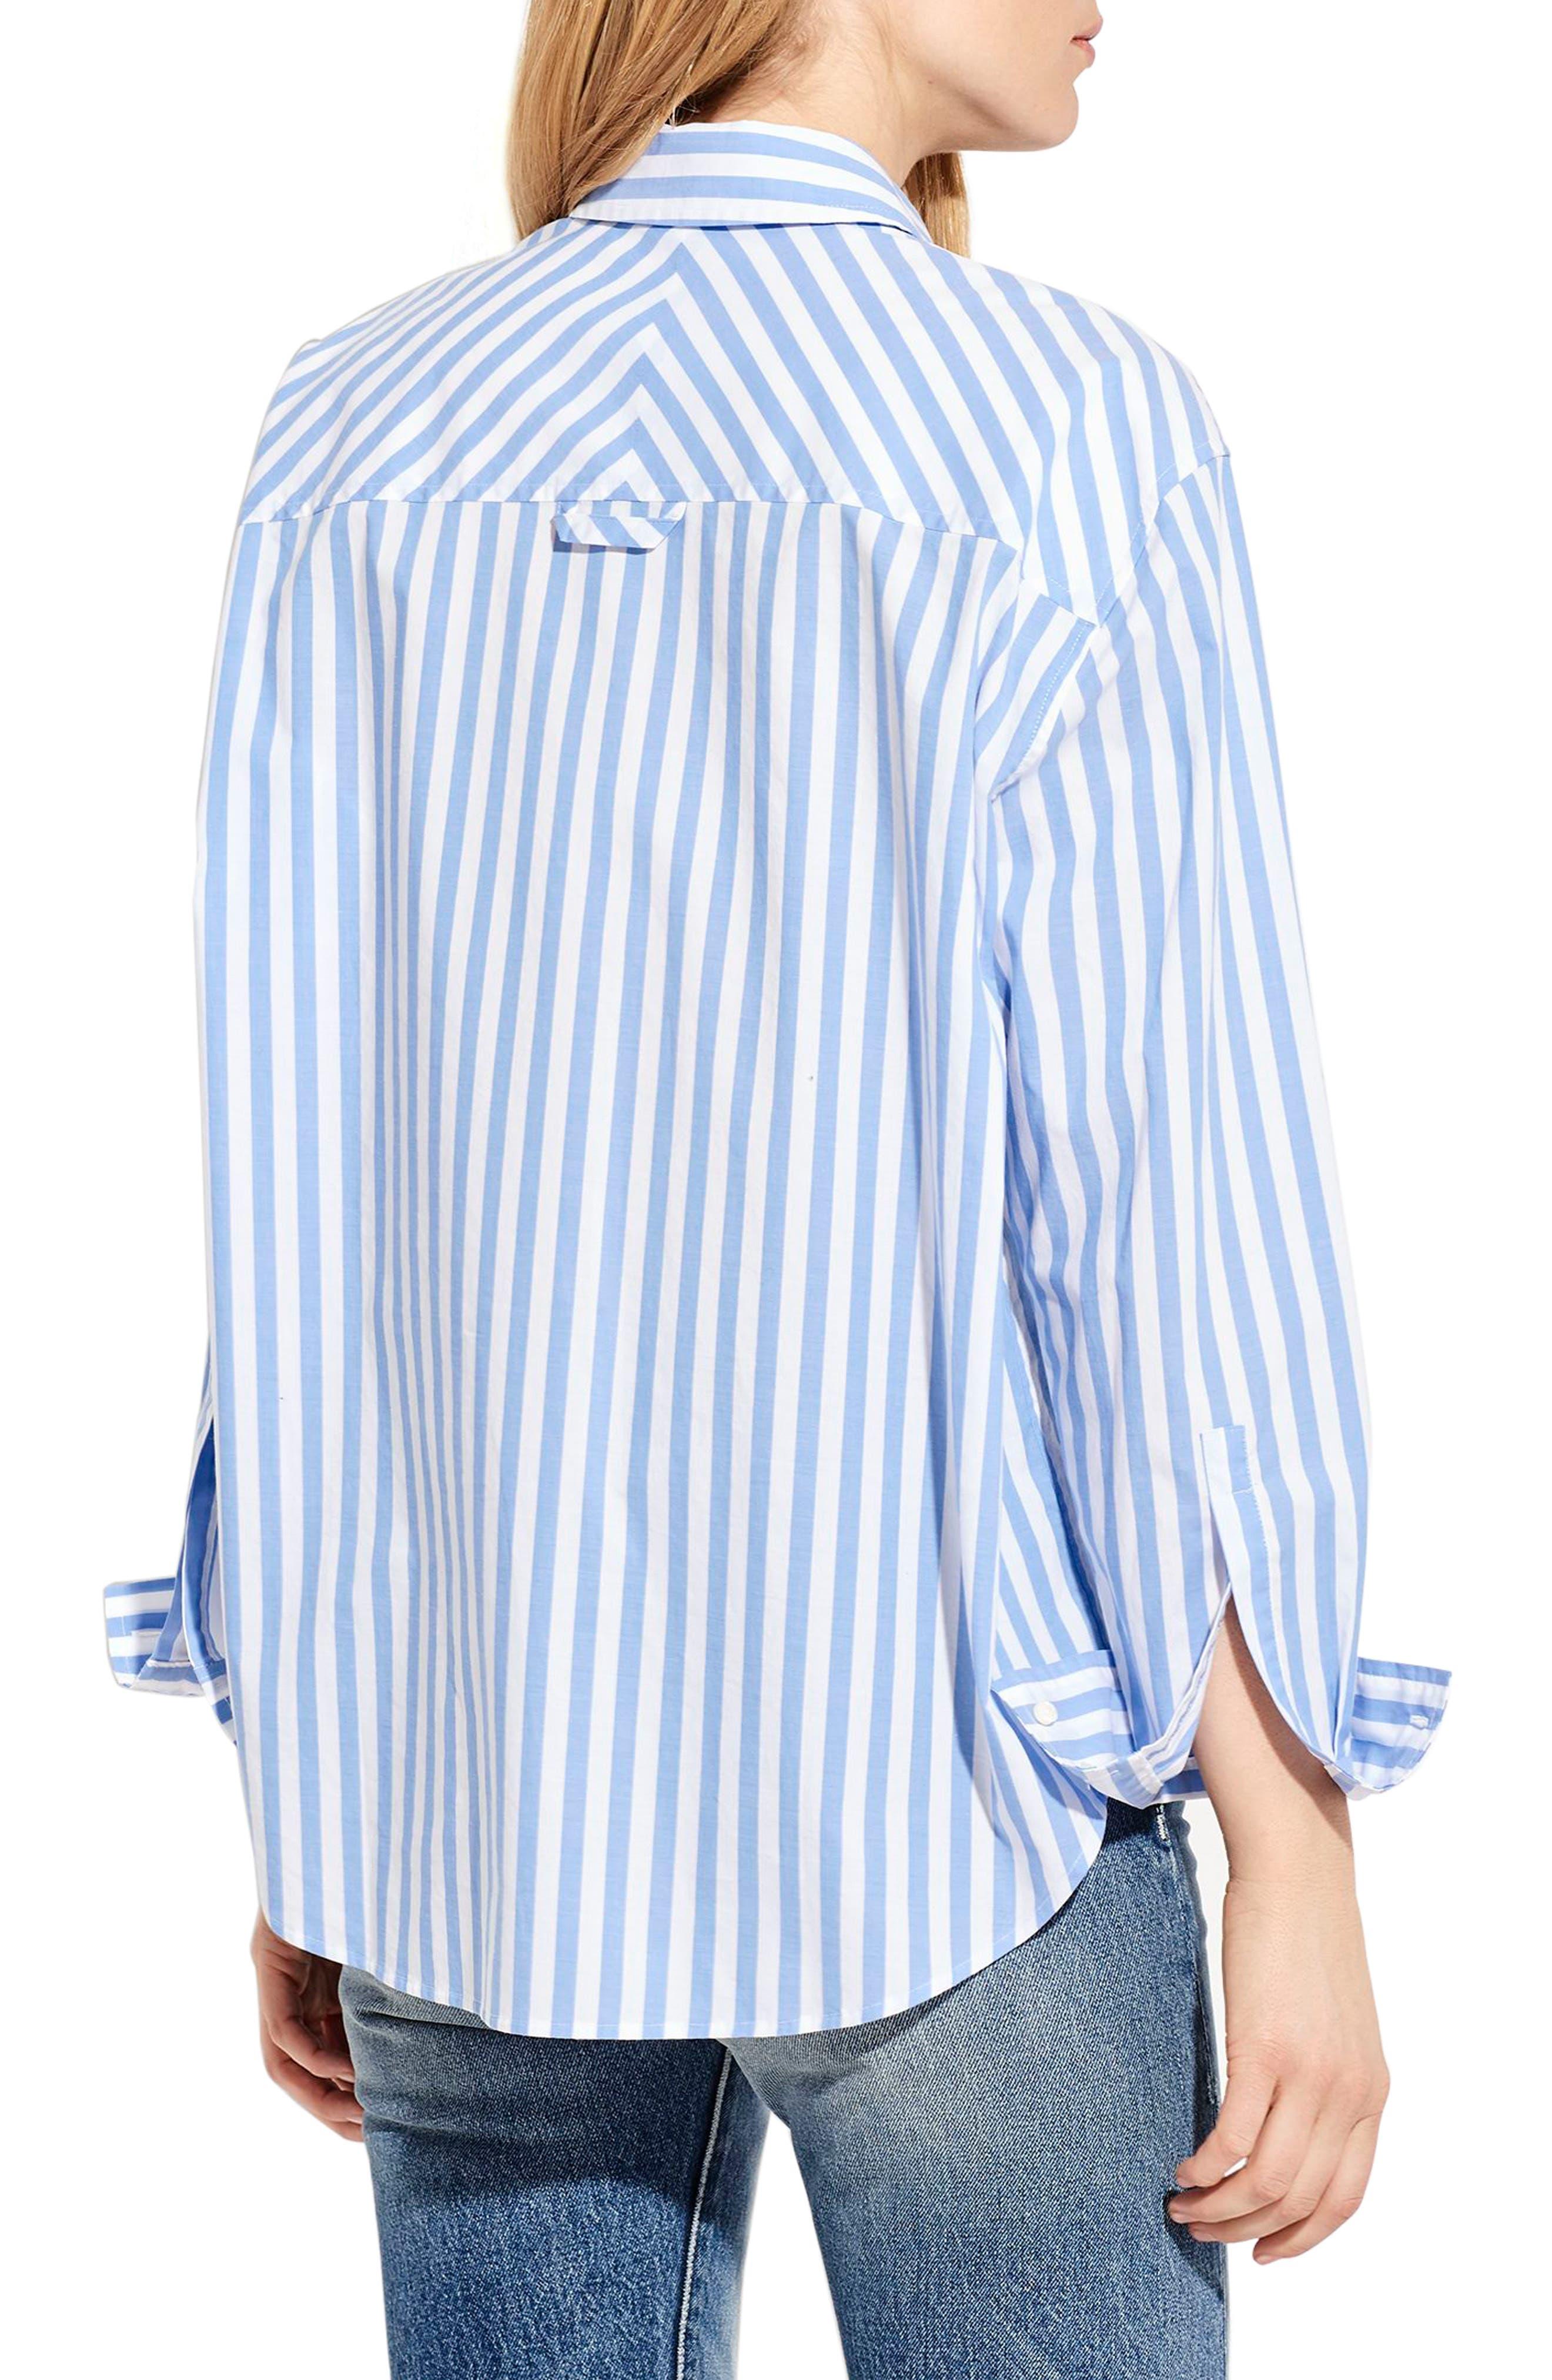 The Deep End Stripe Shirt,                             Alternate thumbnail 2, color,                             Blue/ White Stripe